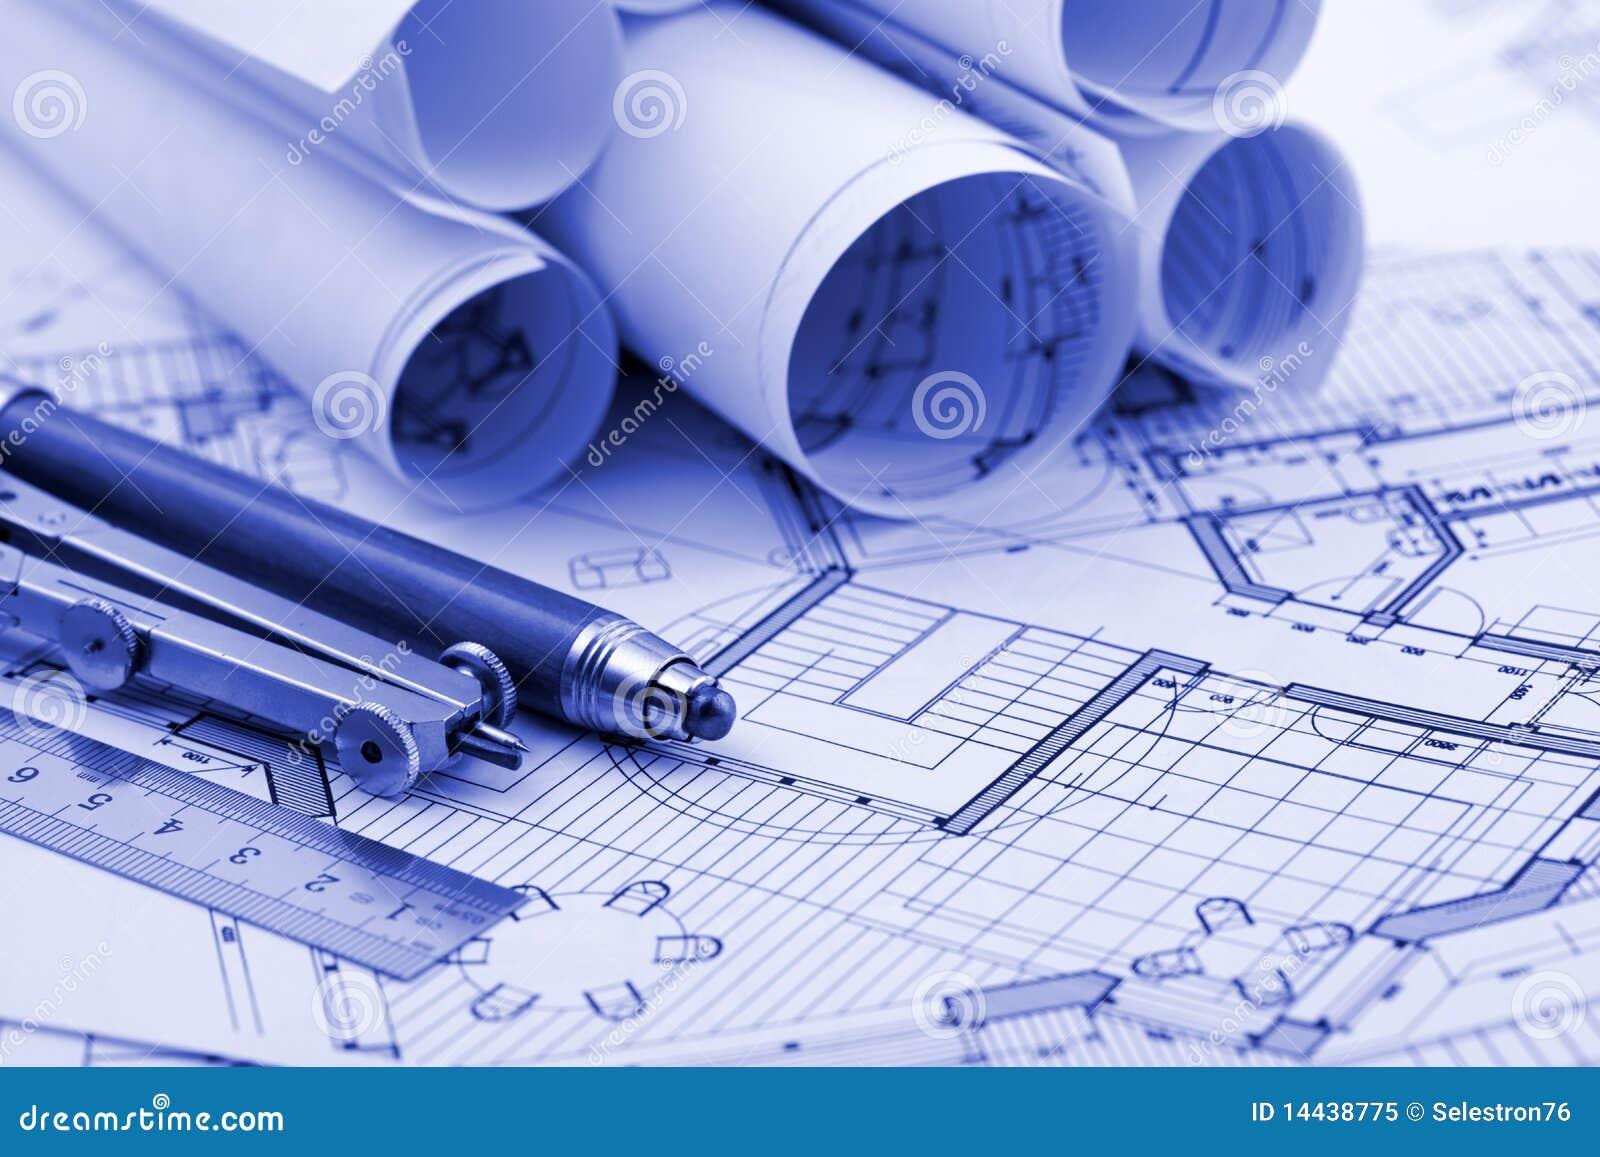 Rolls architecture blueprint work tools 14438775 jpg 1300 215 957